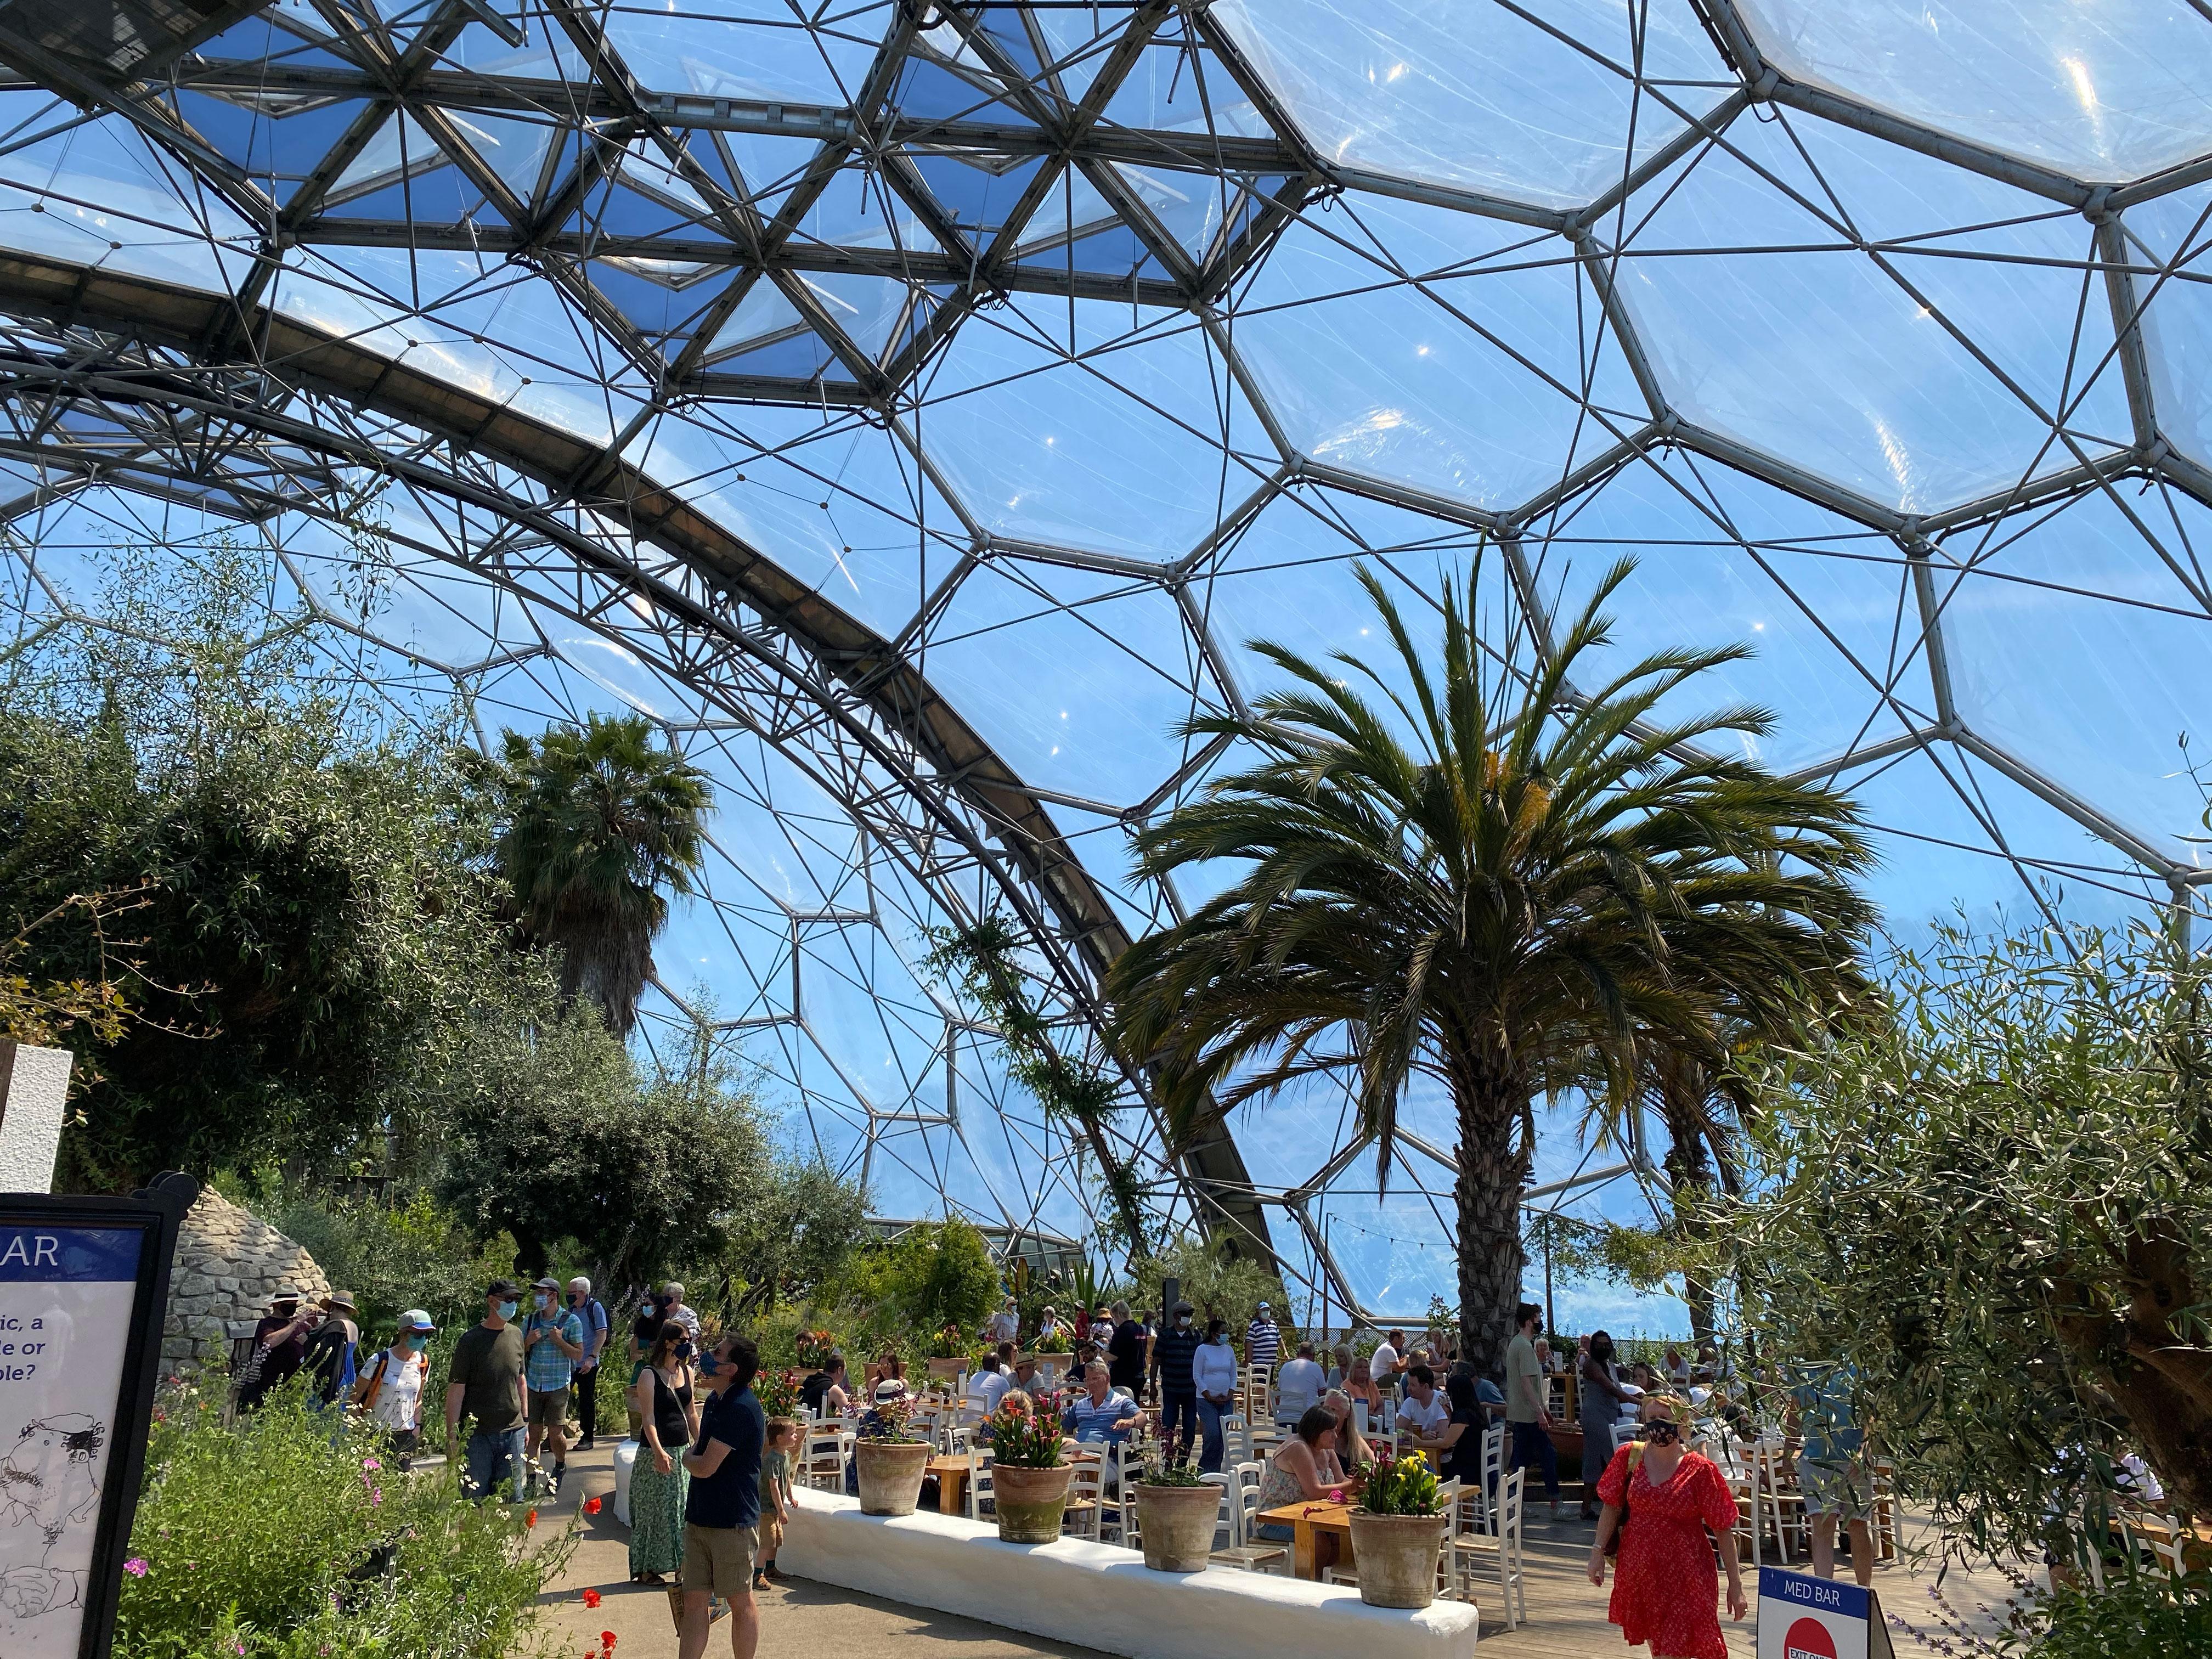 The Eden Project's Mediterranean biome on June 12.